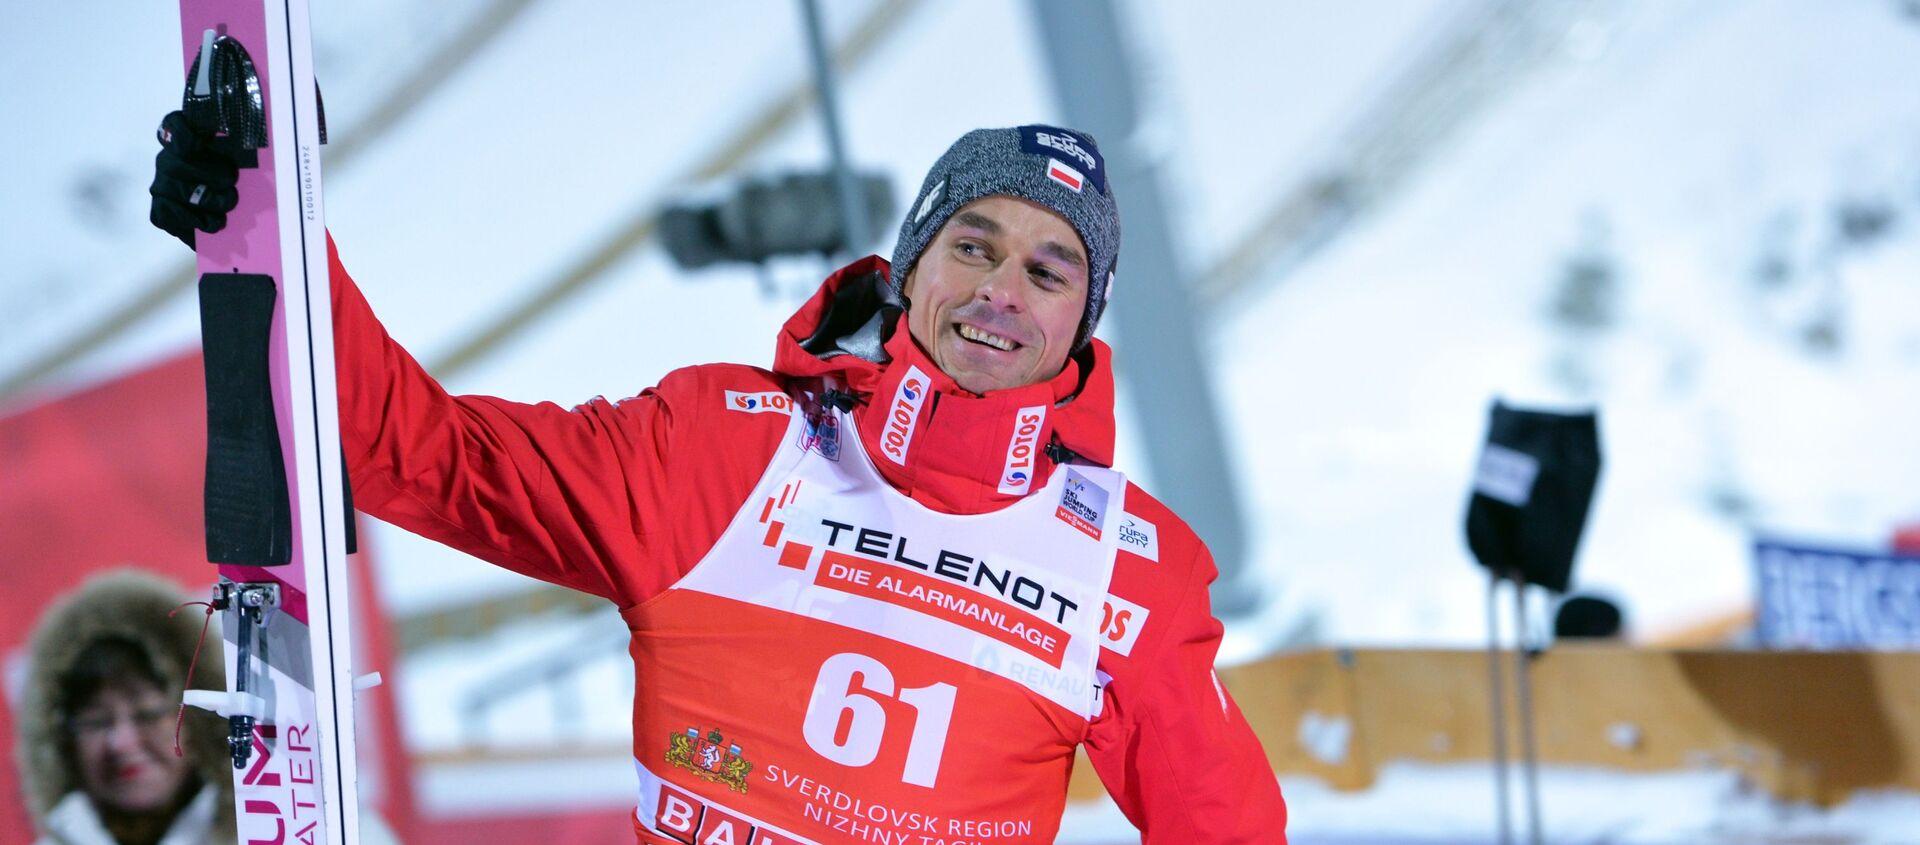 Polski skoczek narciarski Piotr Żyła - Sputnik Polska, 1920, 27.02.2021